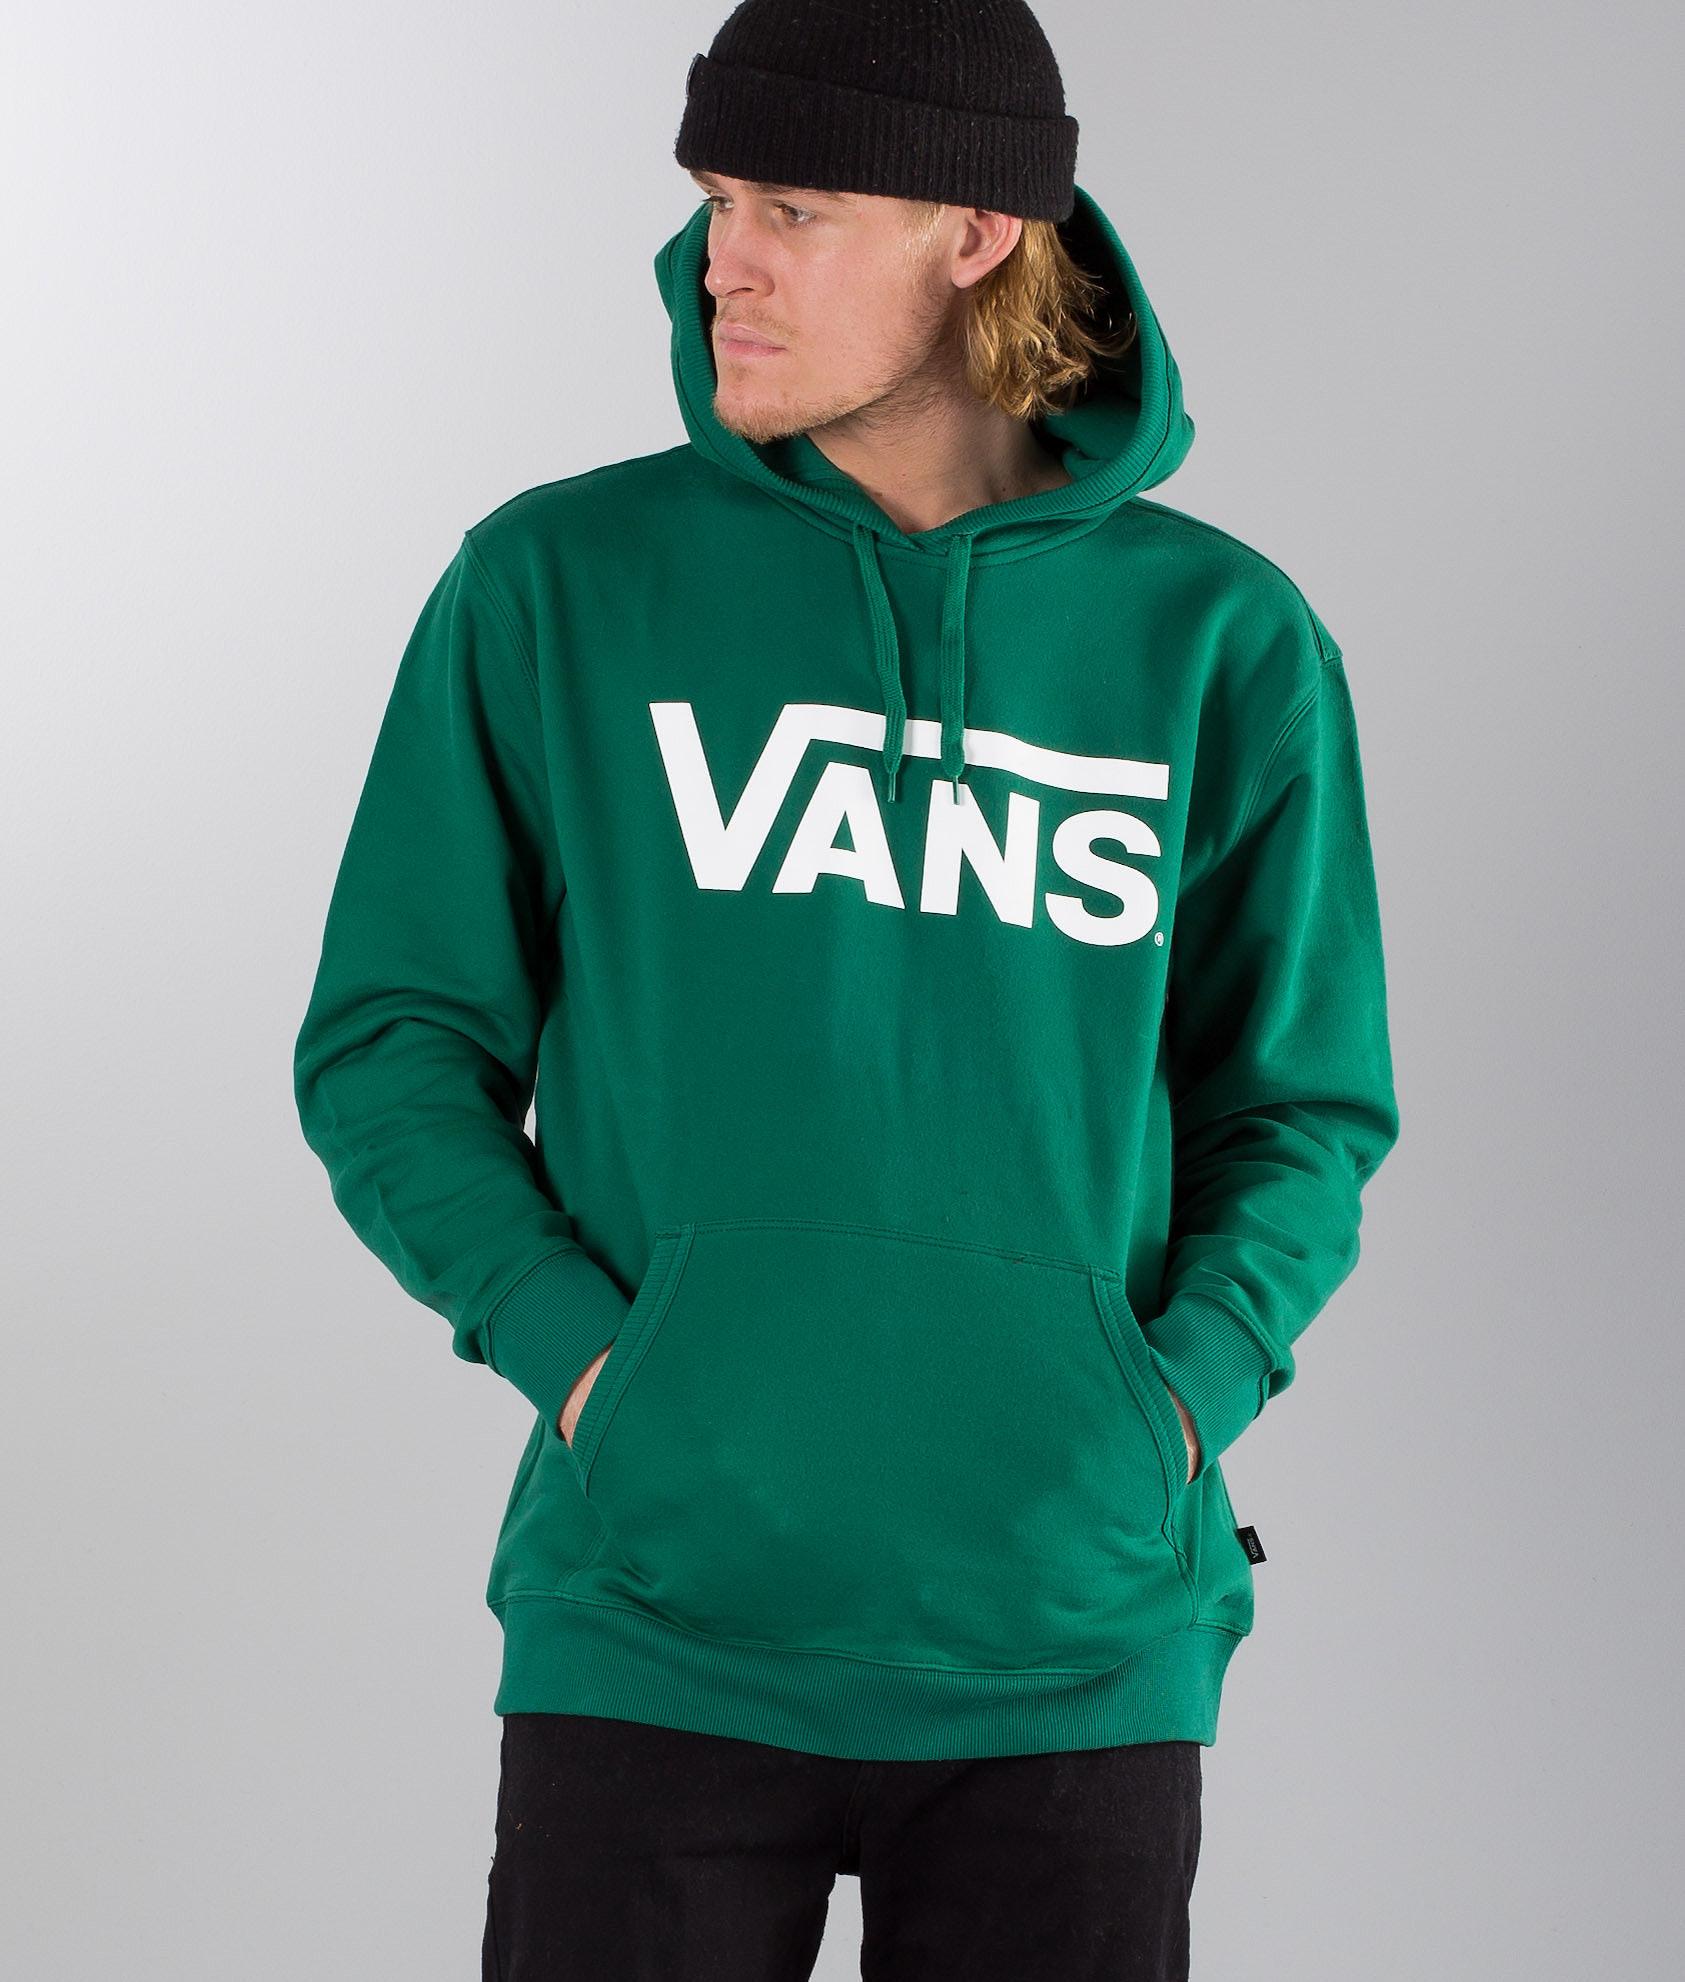 a5d4de45eb Vans Classic Pullover Hoodie Evergreen